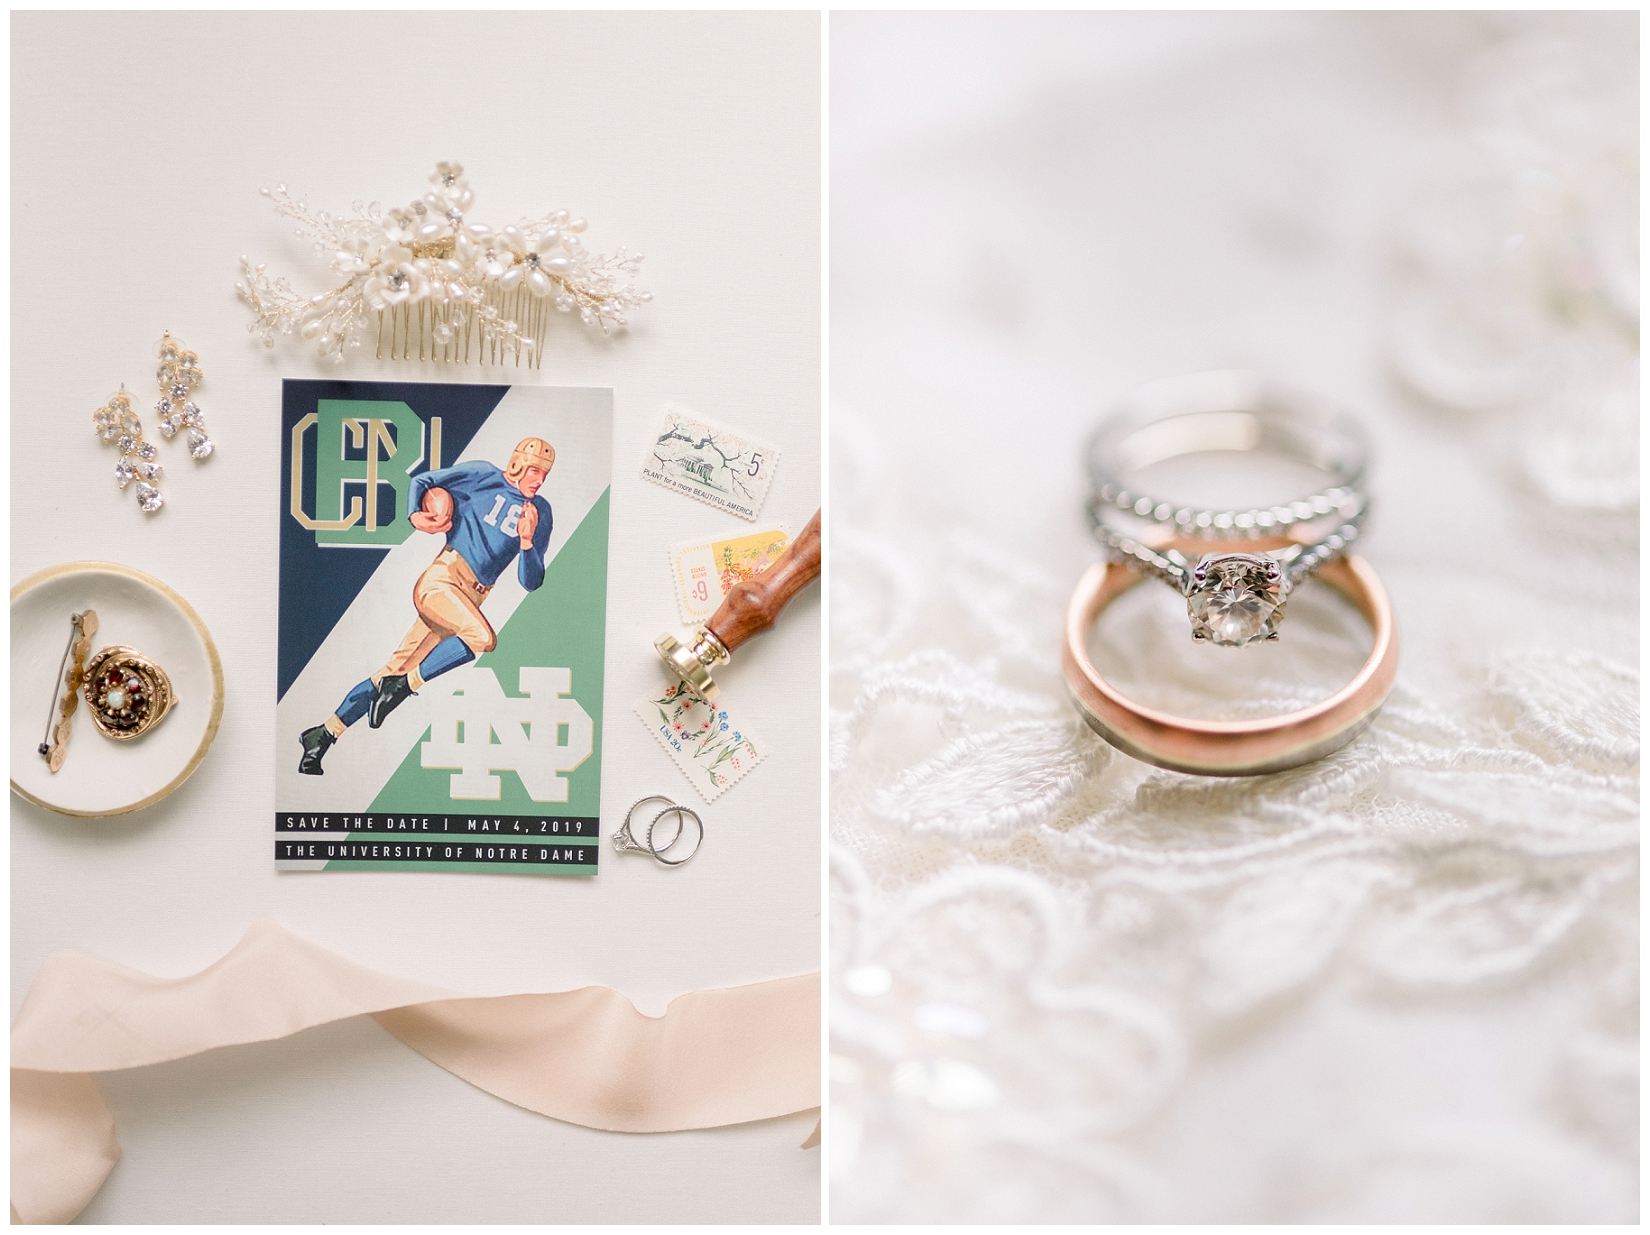 cat-alkire-wedding-photographer-indiana-chicago-indianapolis-fort-wayne_1183.jpg